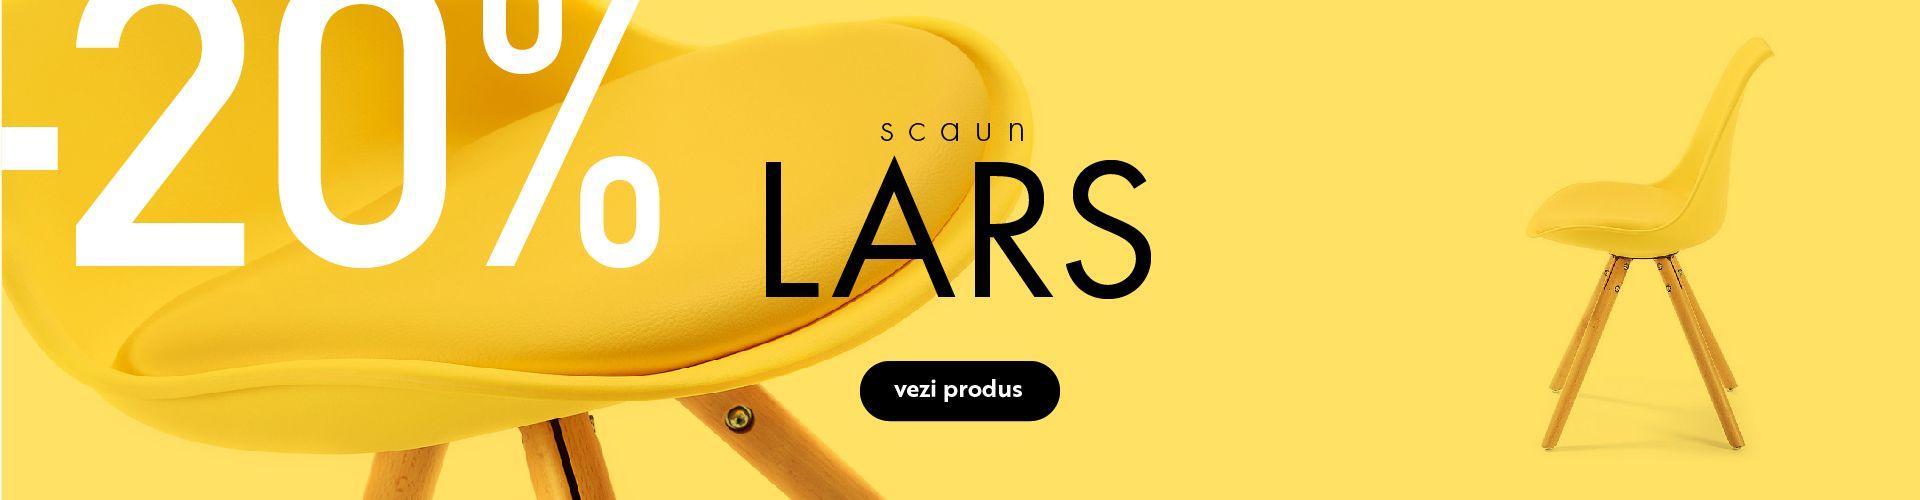 Scaun Lars